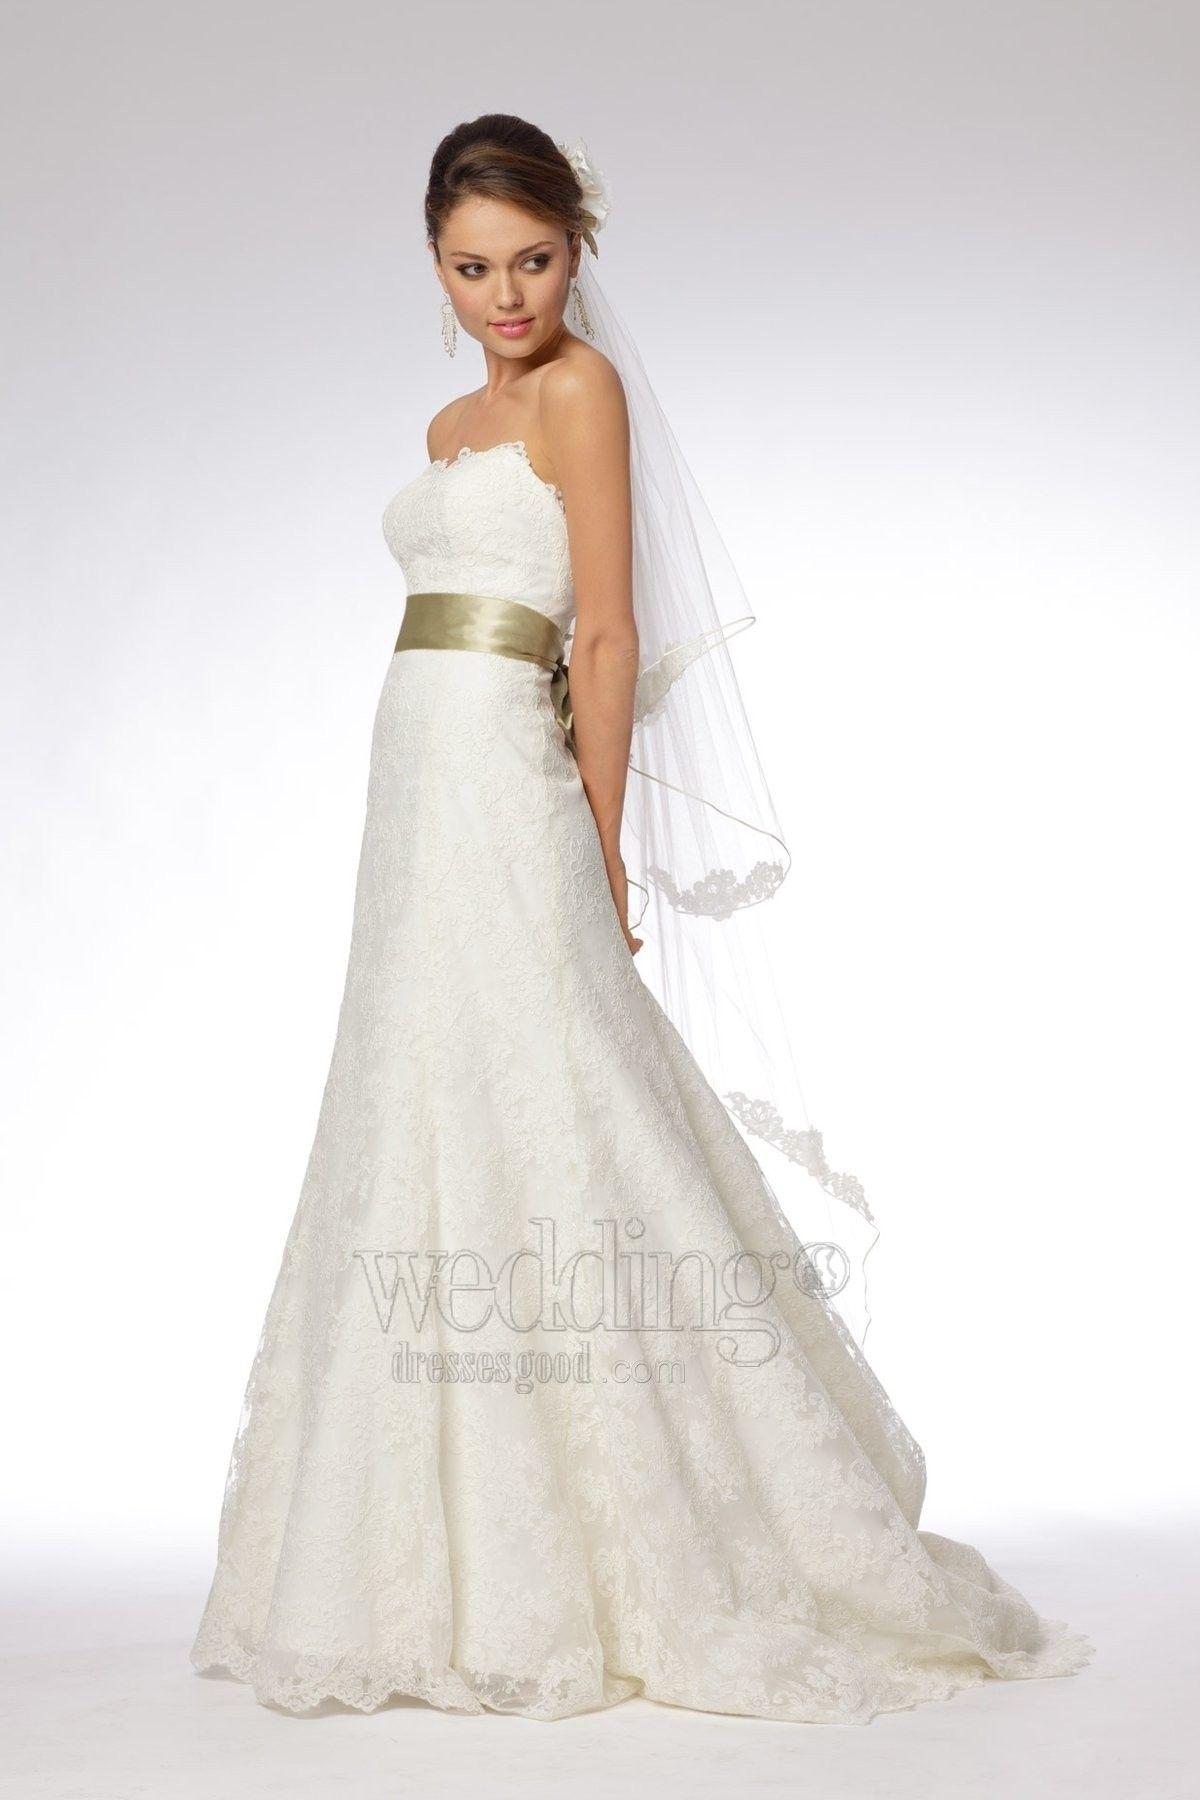 Sari Style Wedding Dress Online-Zipper Wedding Dress weddingdresses0314A